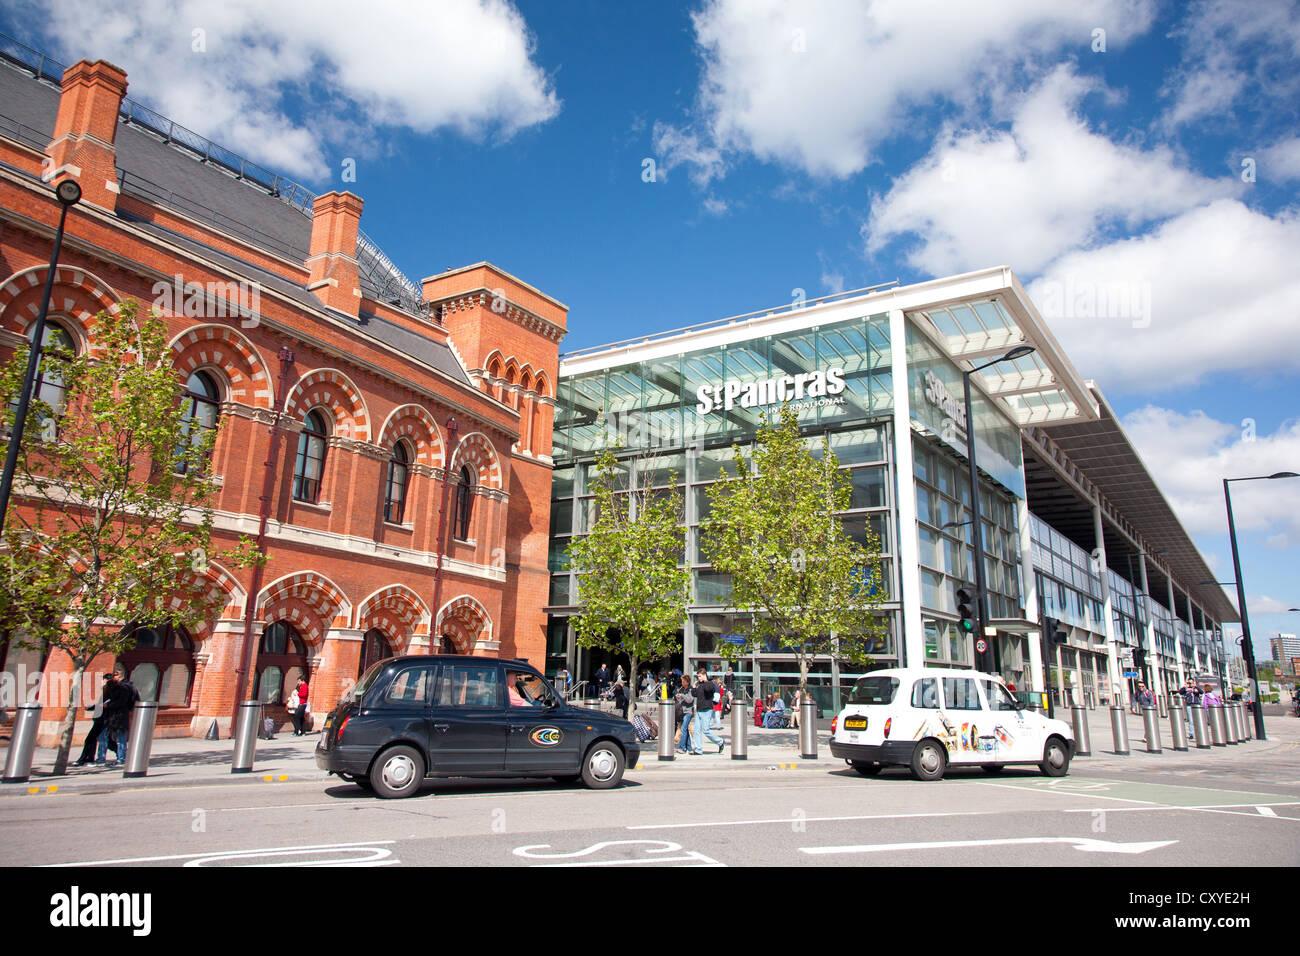 England. London. Exterior of St. Pancras International Station. - Stock Image